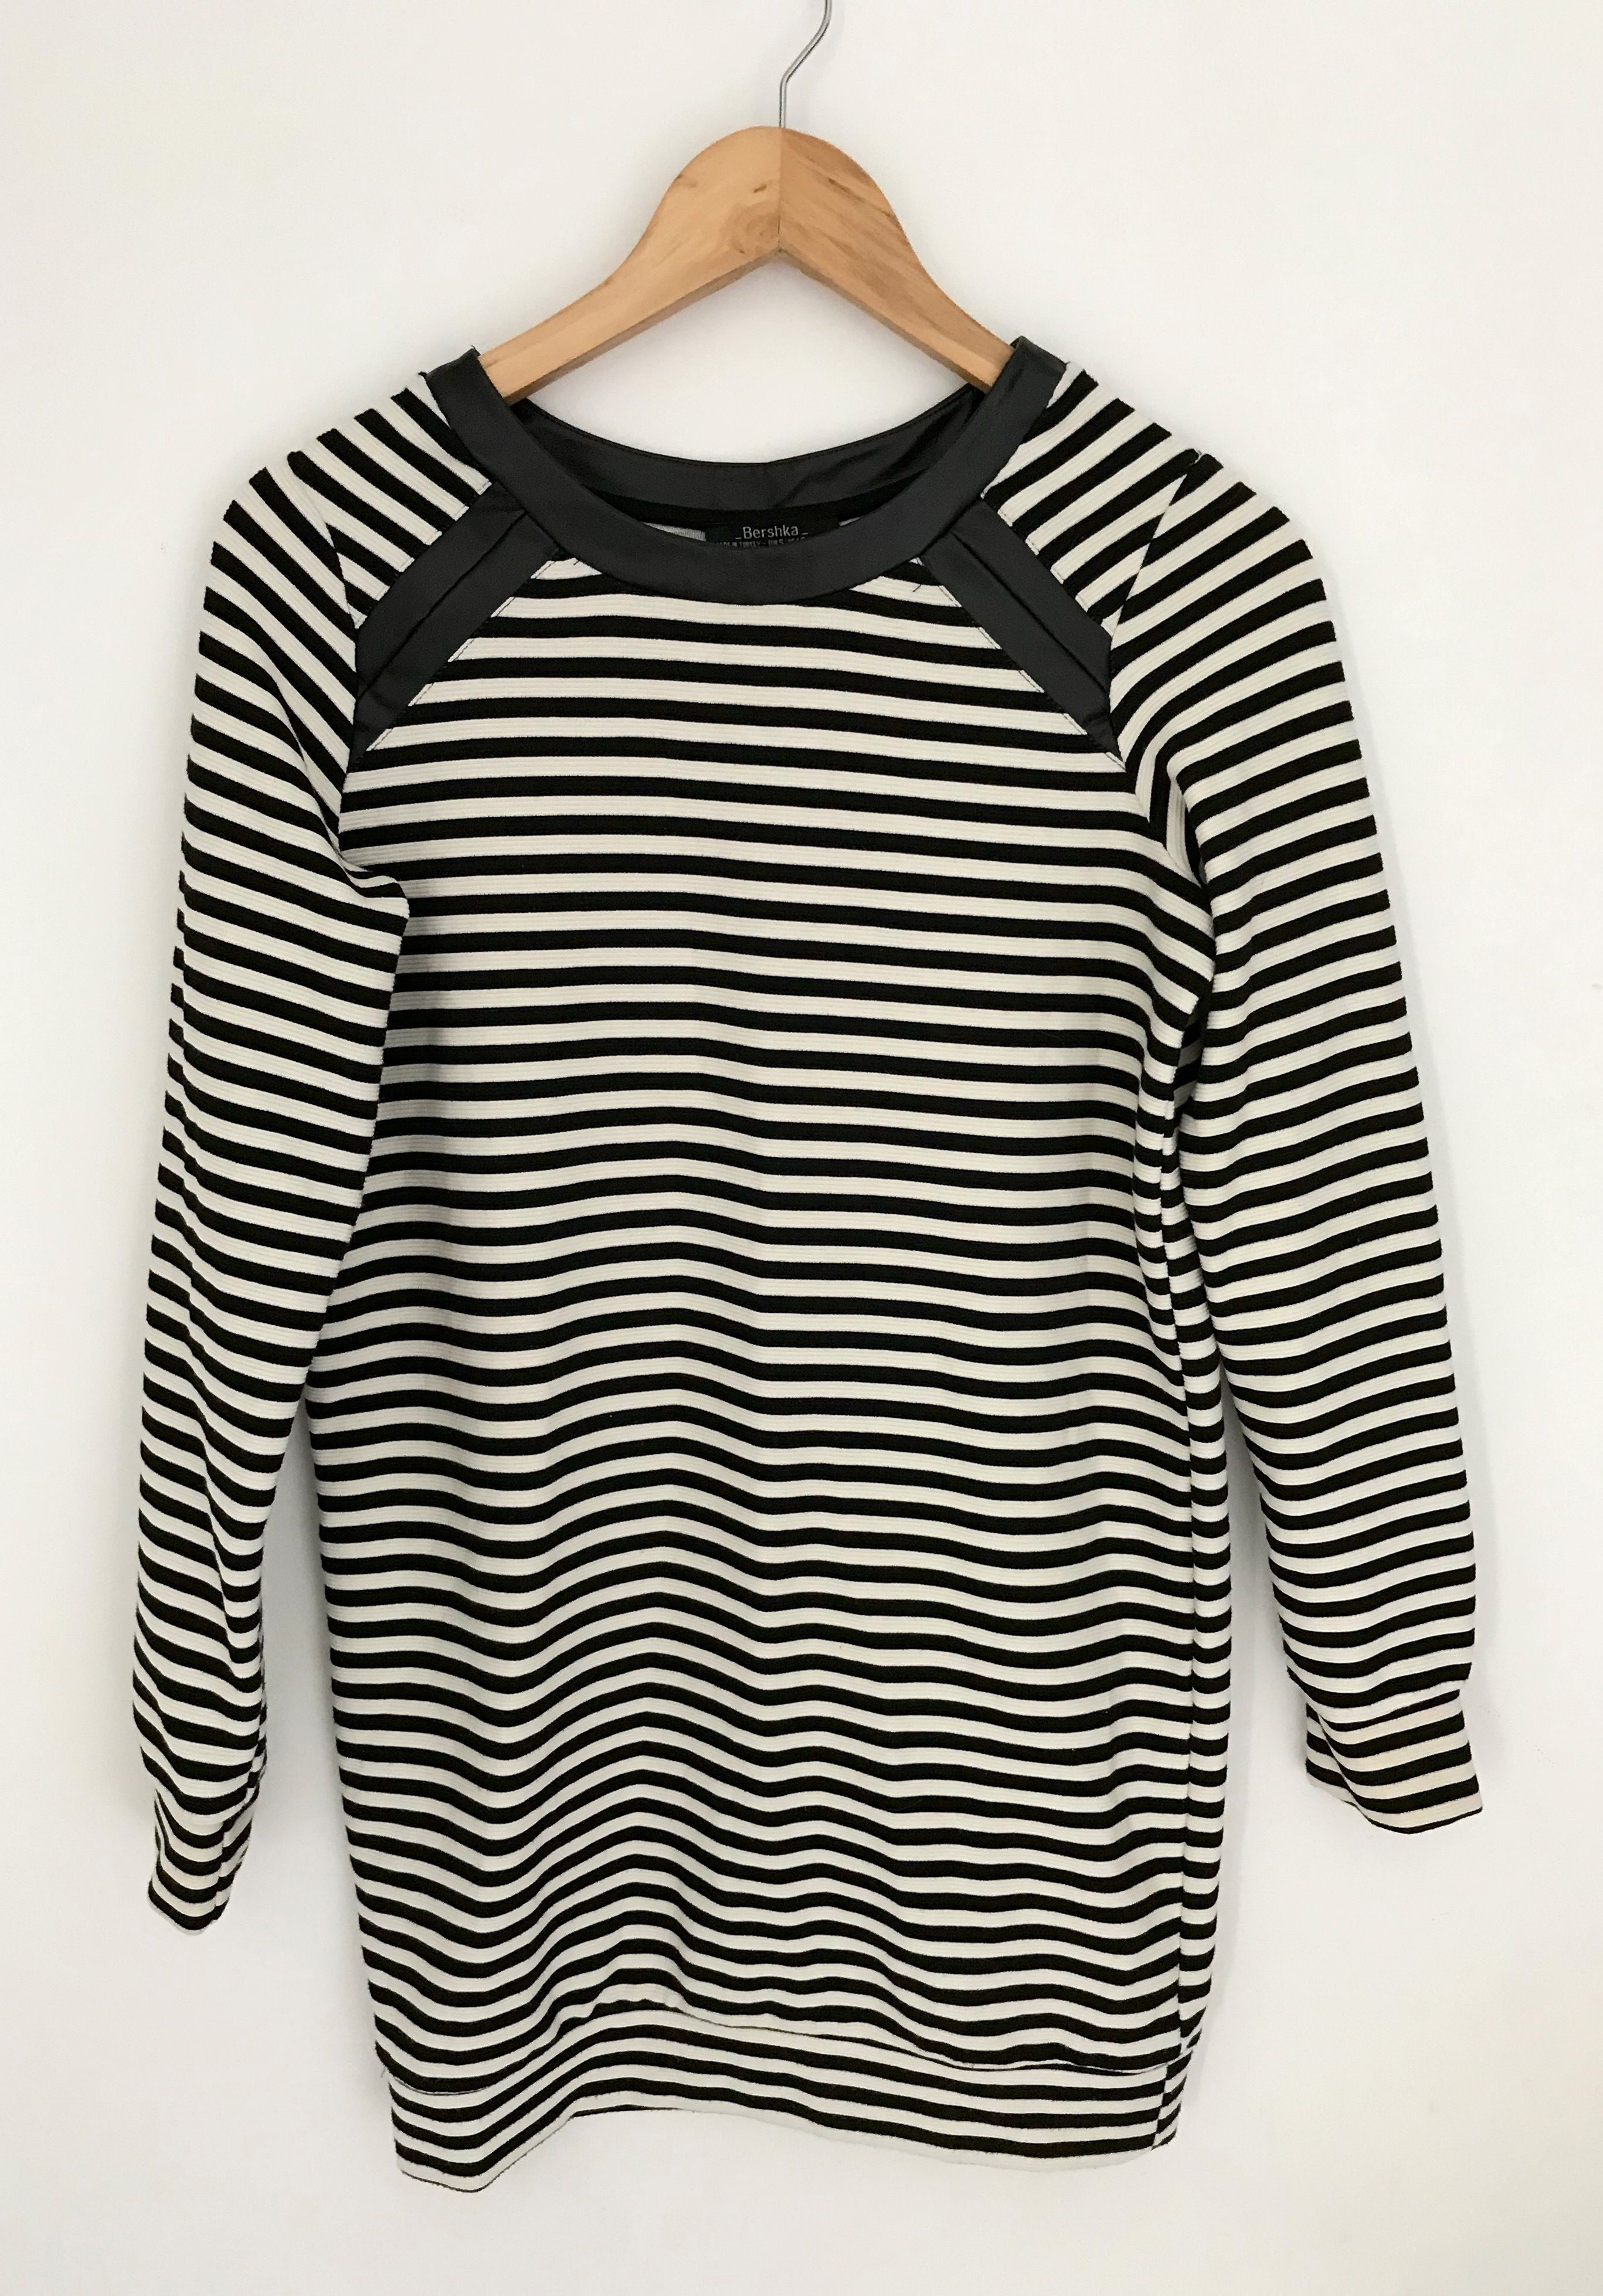 749e22feca2 Robe Bershka Couleur noir et blanc bande effet simili cuir 📏 Taille S - 36  FR